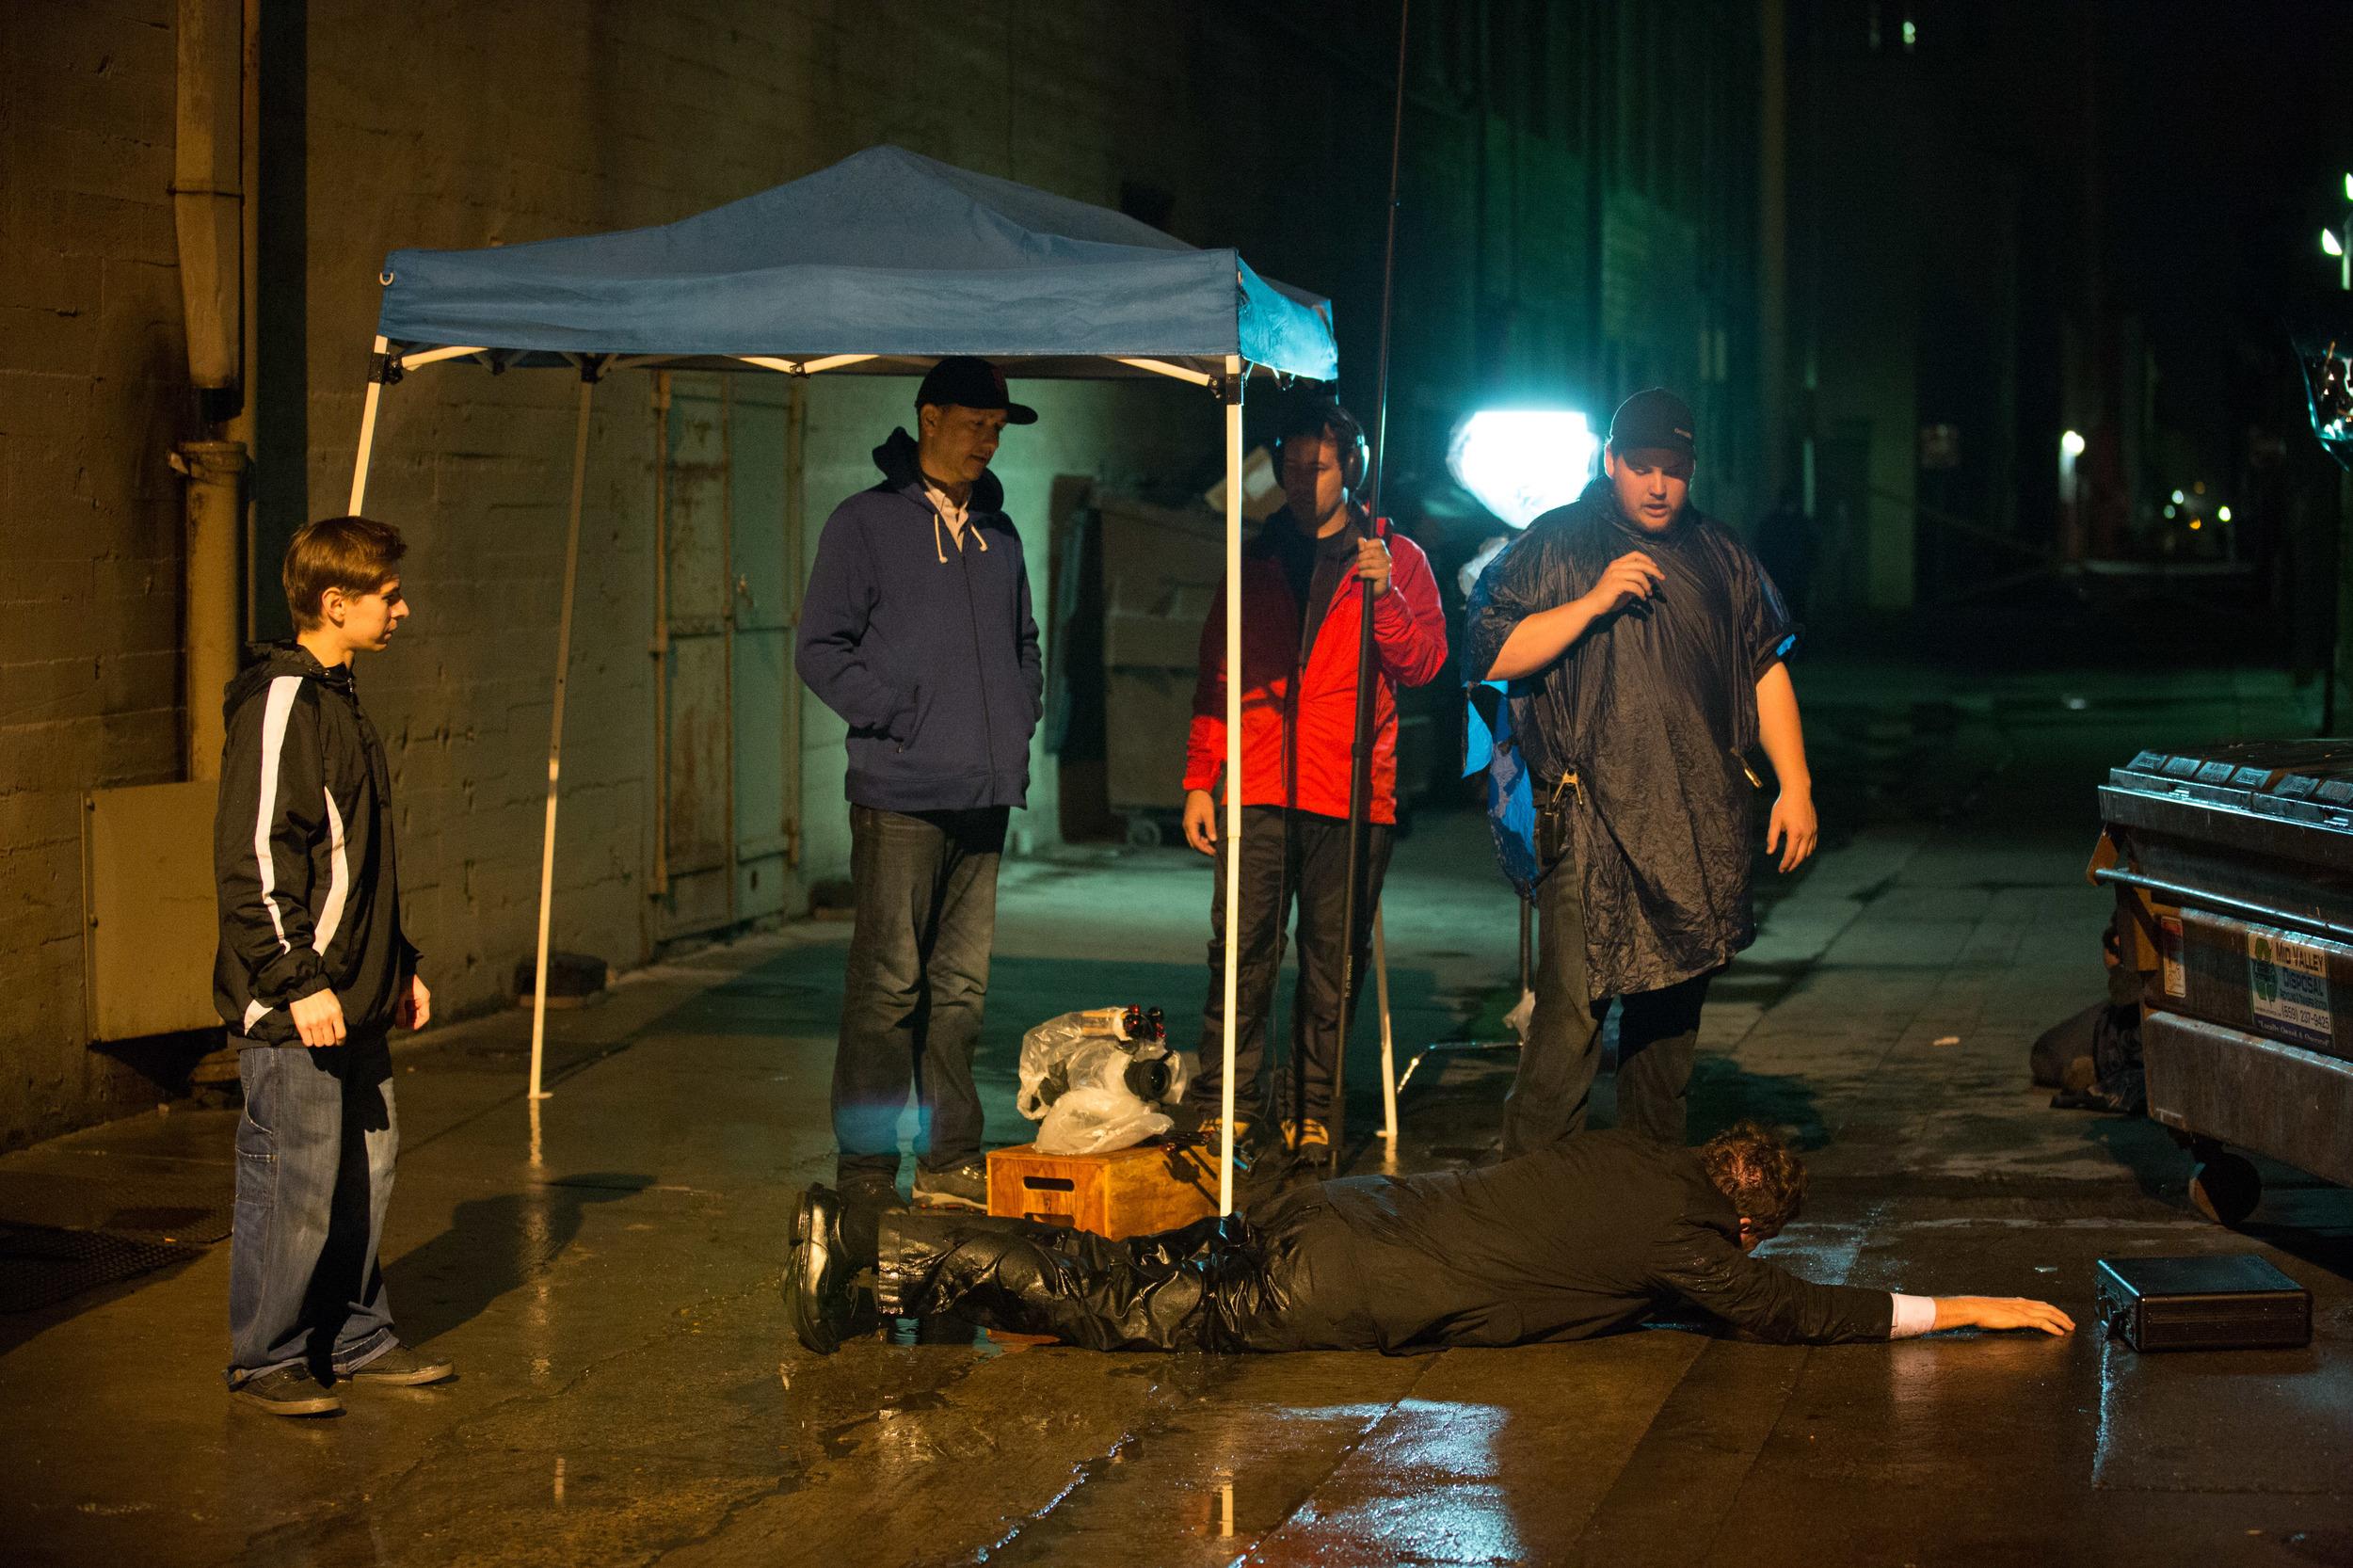 L-R: Chris Lofing (Co-Director), Enrique Meza (Camera Operator), Vincent Keenan (Sound Engineer), Kyle Gentz (Director of Photography), Steve Hrdlicka (Businessman). Photo by PJ Barlow.